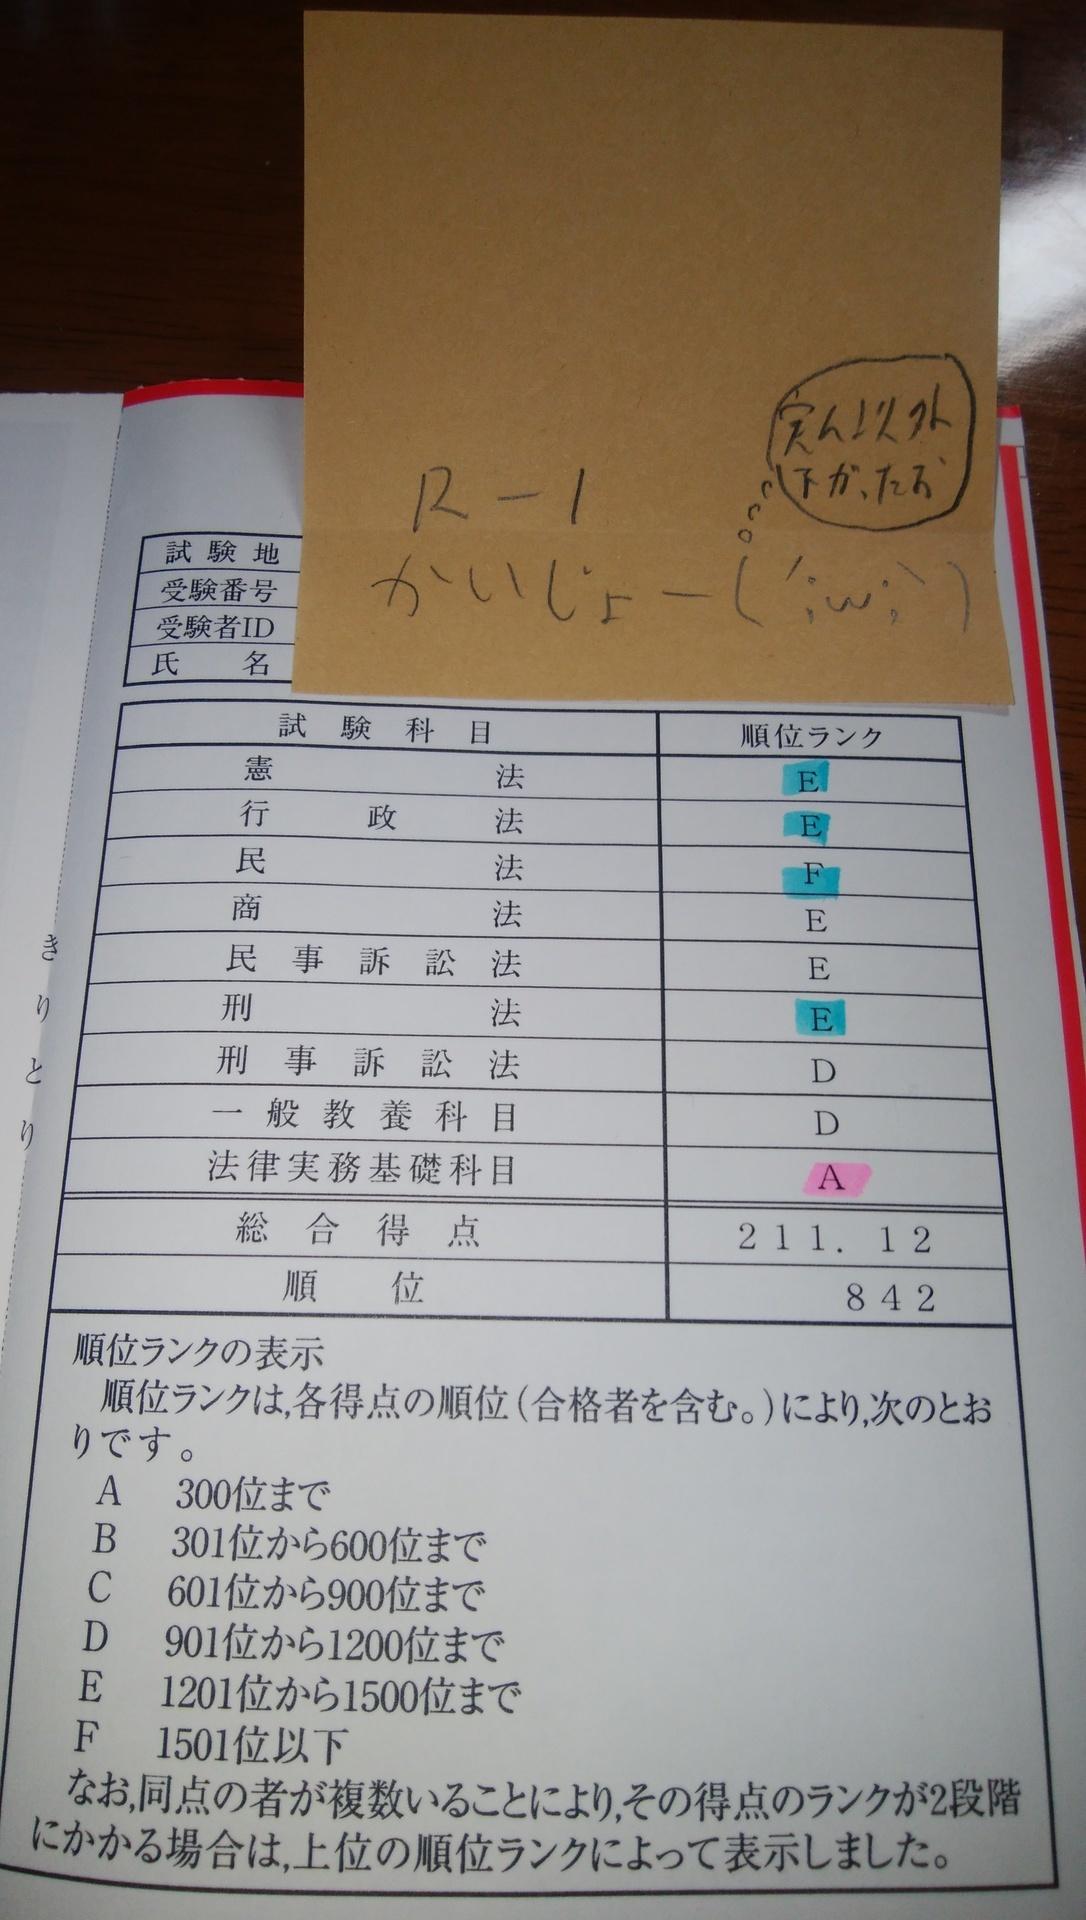 5ch 司法 試験